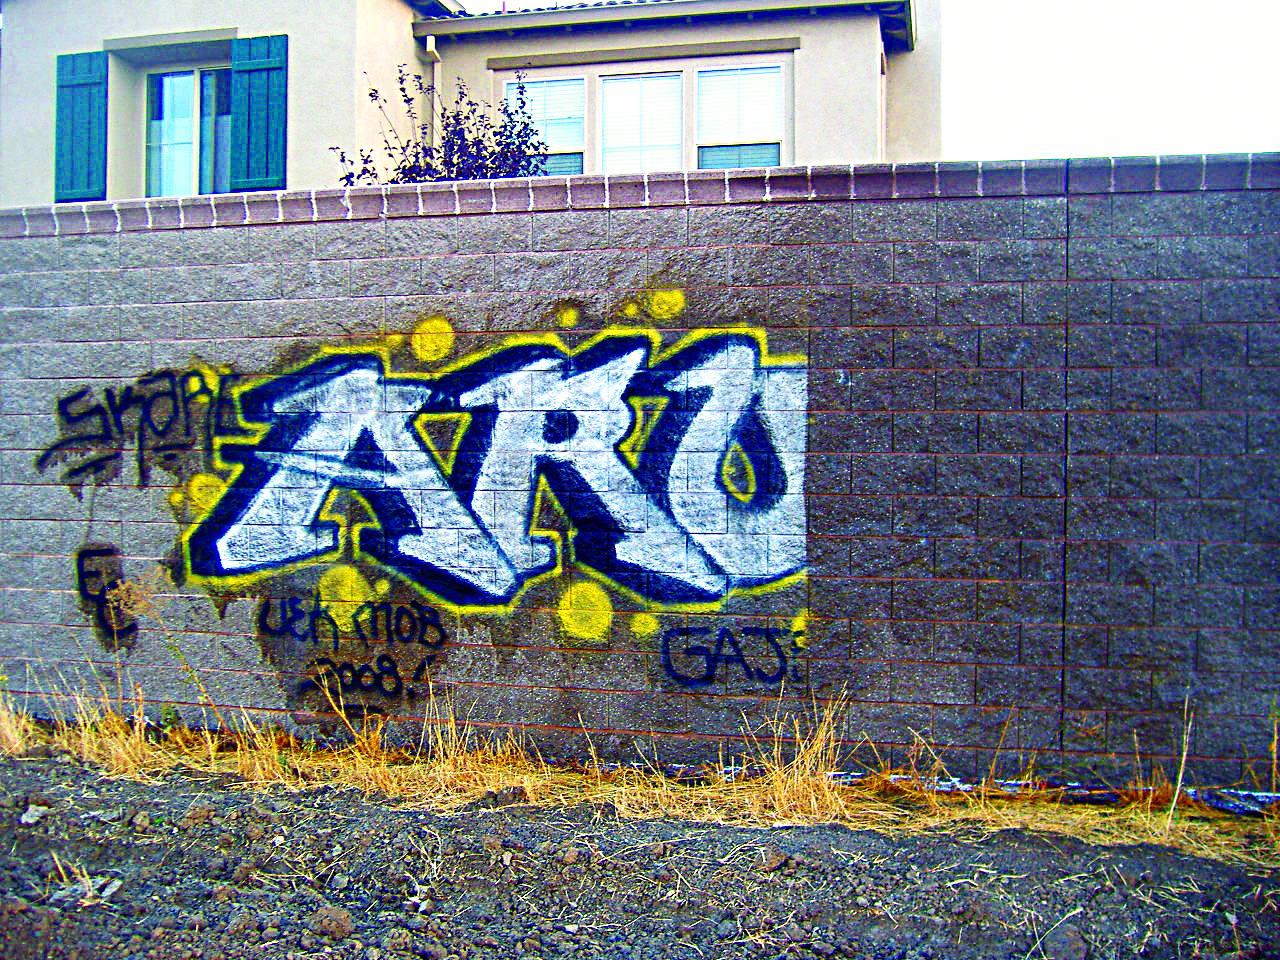 cinder block - Graffiti Removal